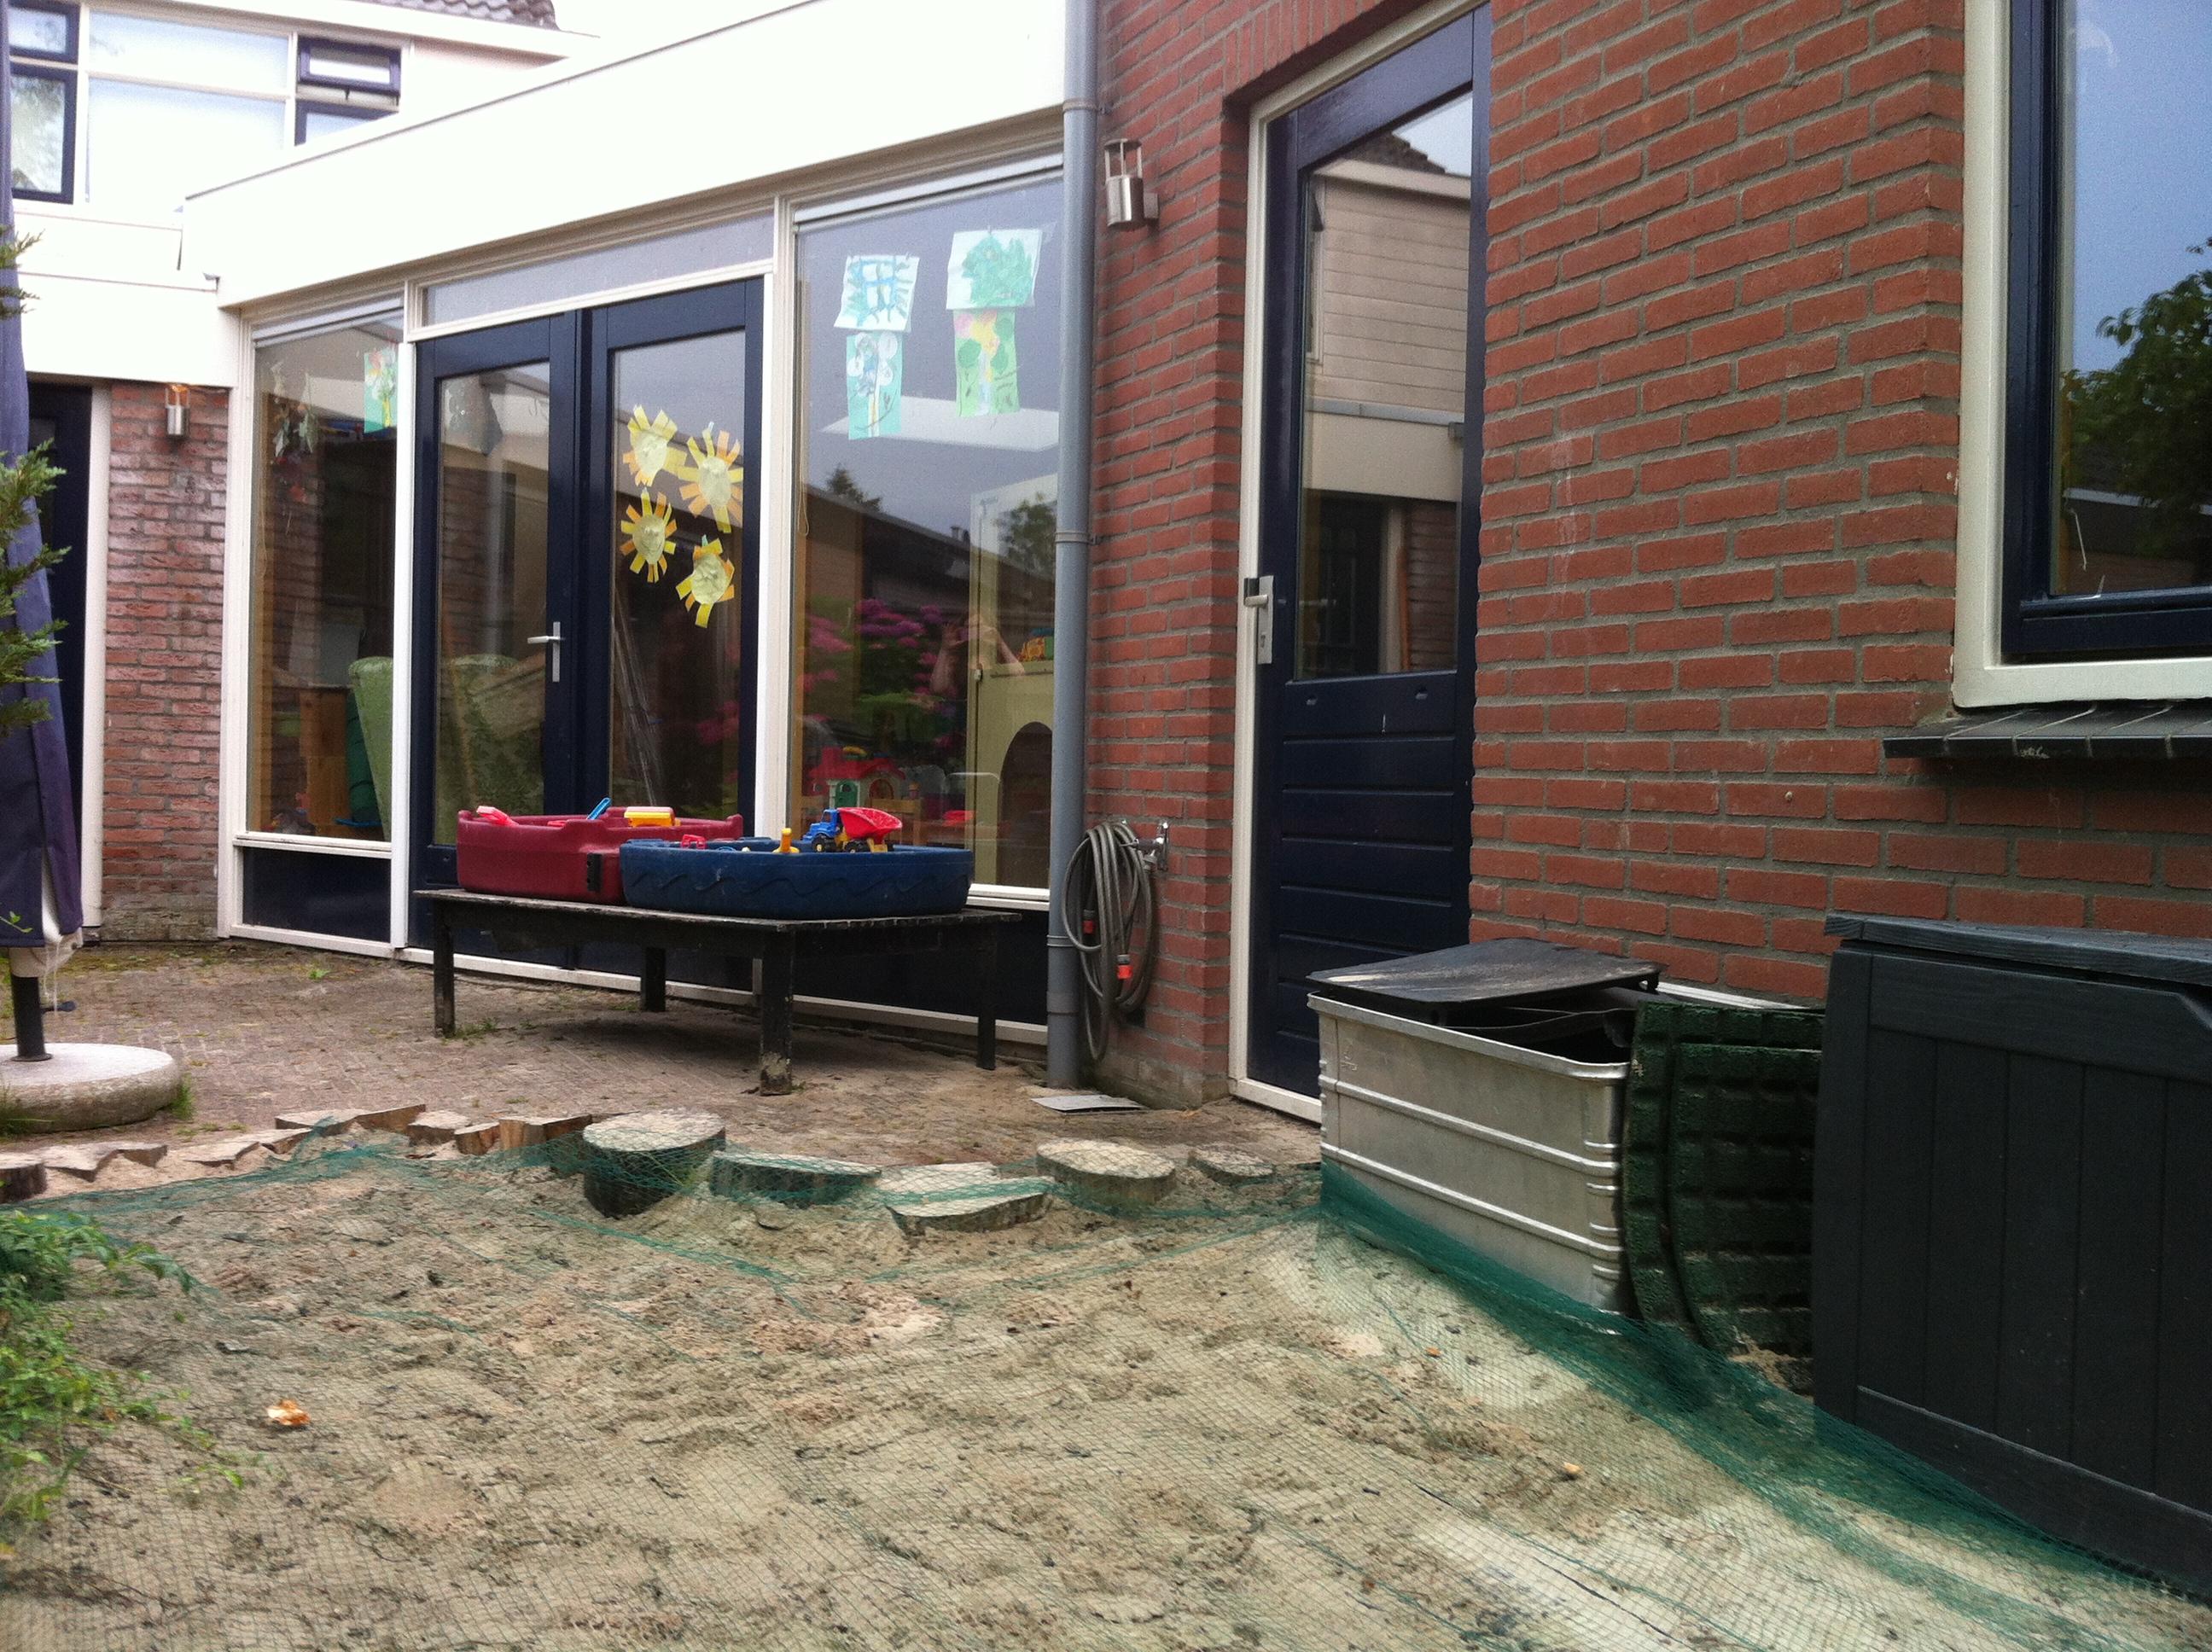 Kinderopvang Poppejans Groningen - kinderdagopvang Gerstrstraat